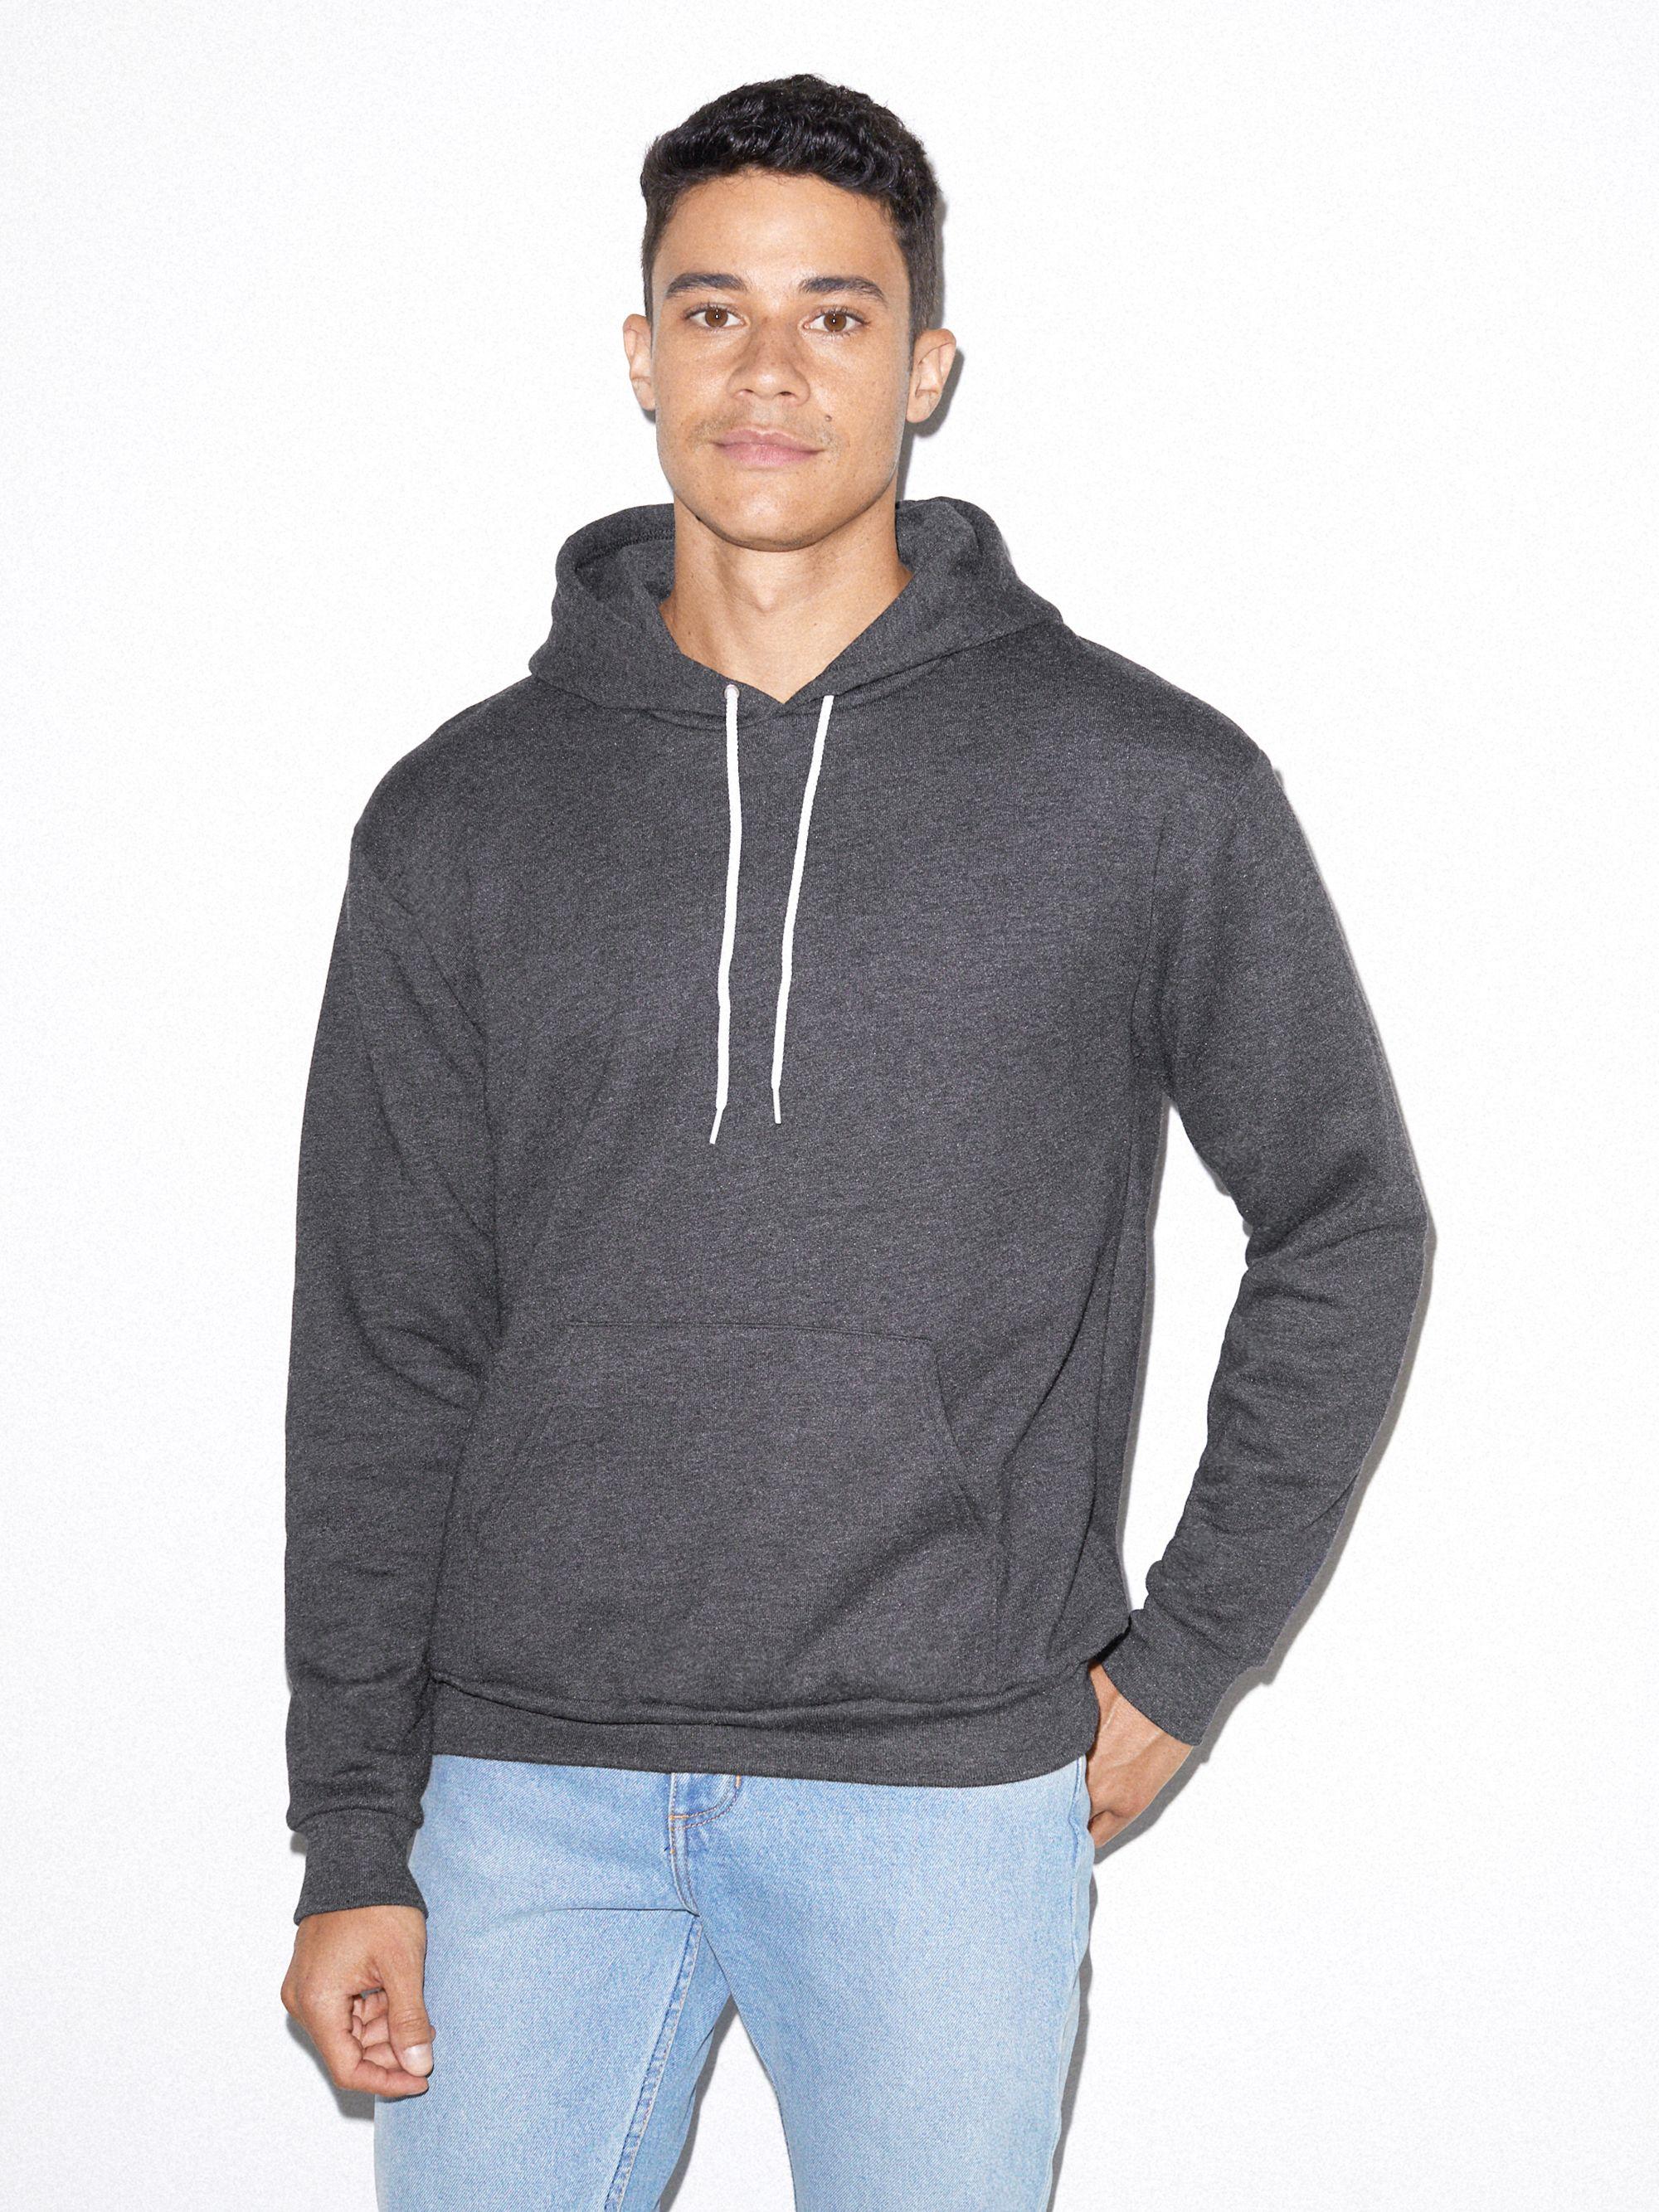 Women's Hoodies & Sweatshirts | American Apparel